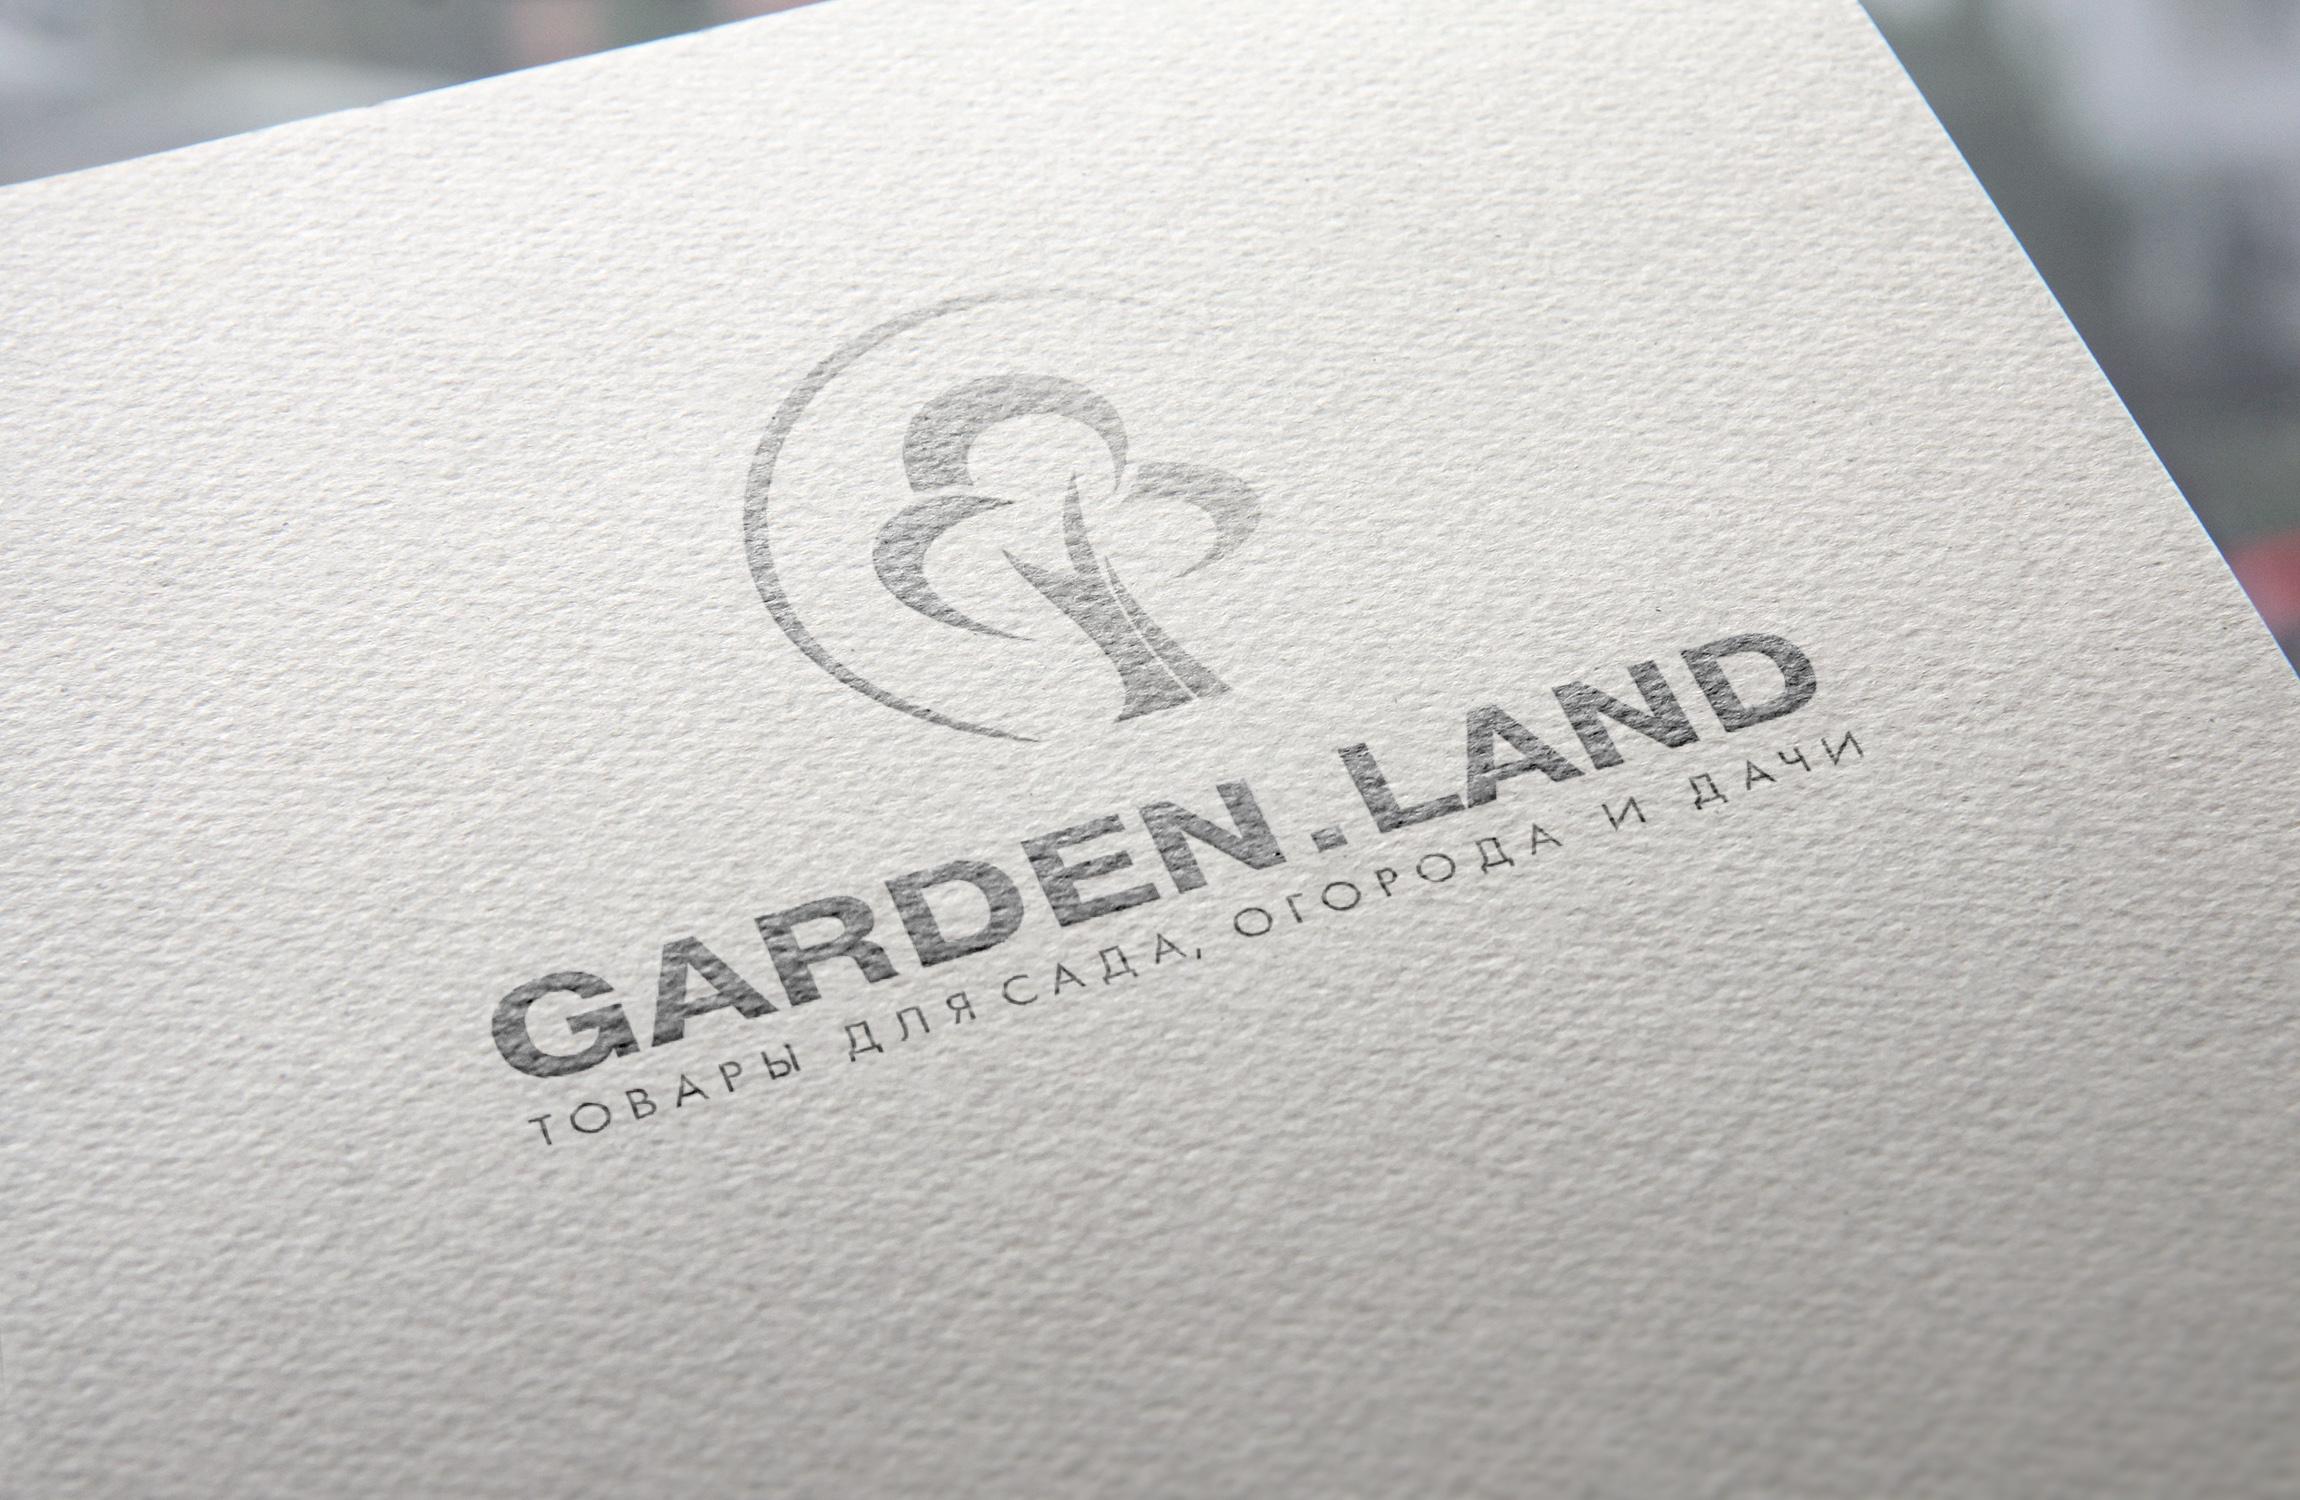 Создание логотипа компании Garden.Land фото f_6015986e7b16c9cf.jpg